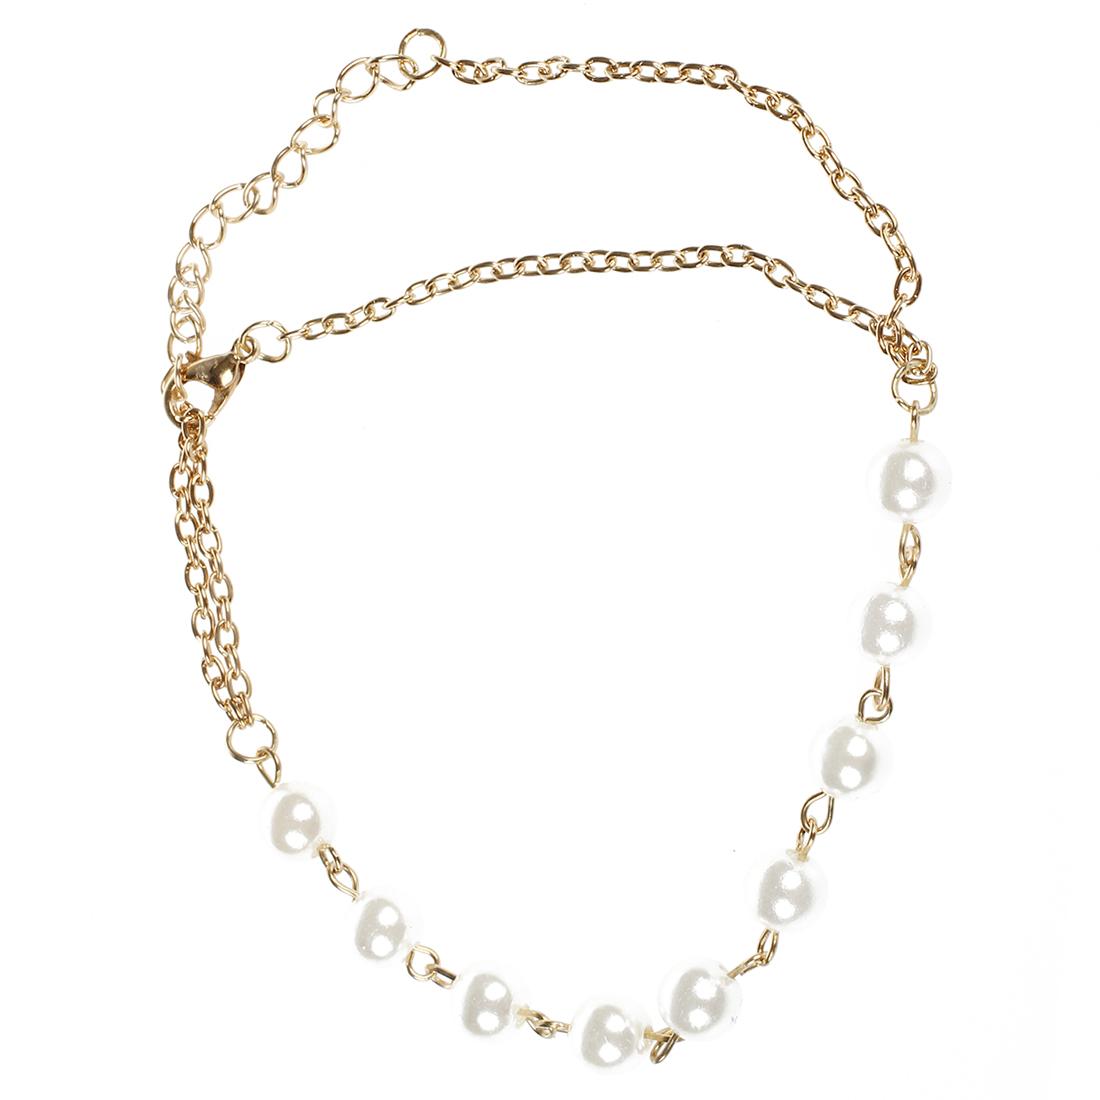 frauen perlen armband armband mit angebrachtem ketten ring j2t9 d7a3 q3y1 ebay. Black Bedroom Furniture Sets. Home Design Ideas